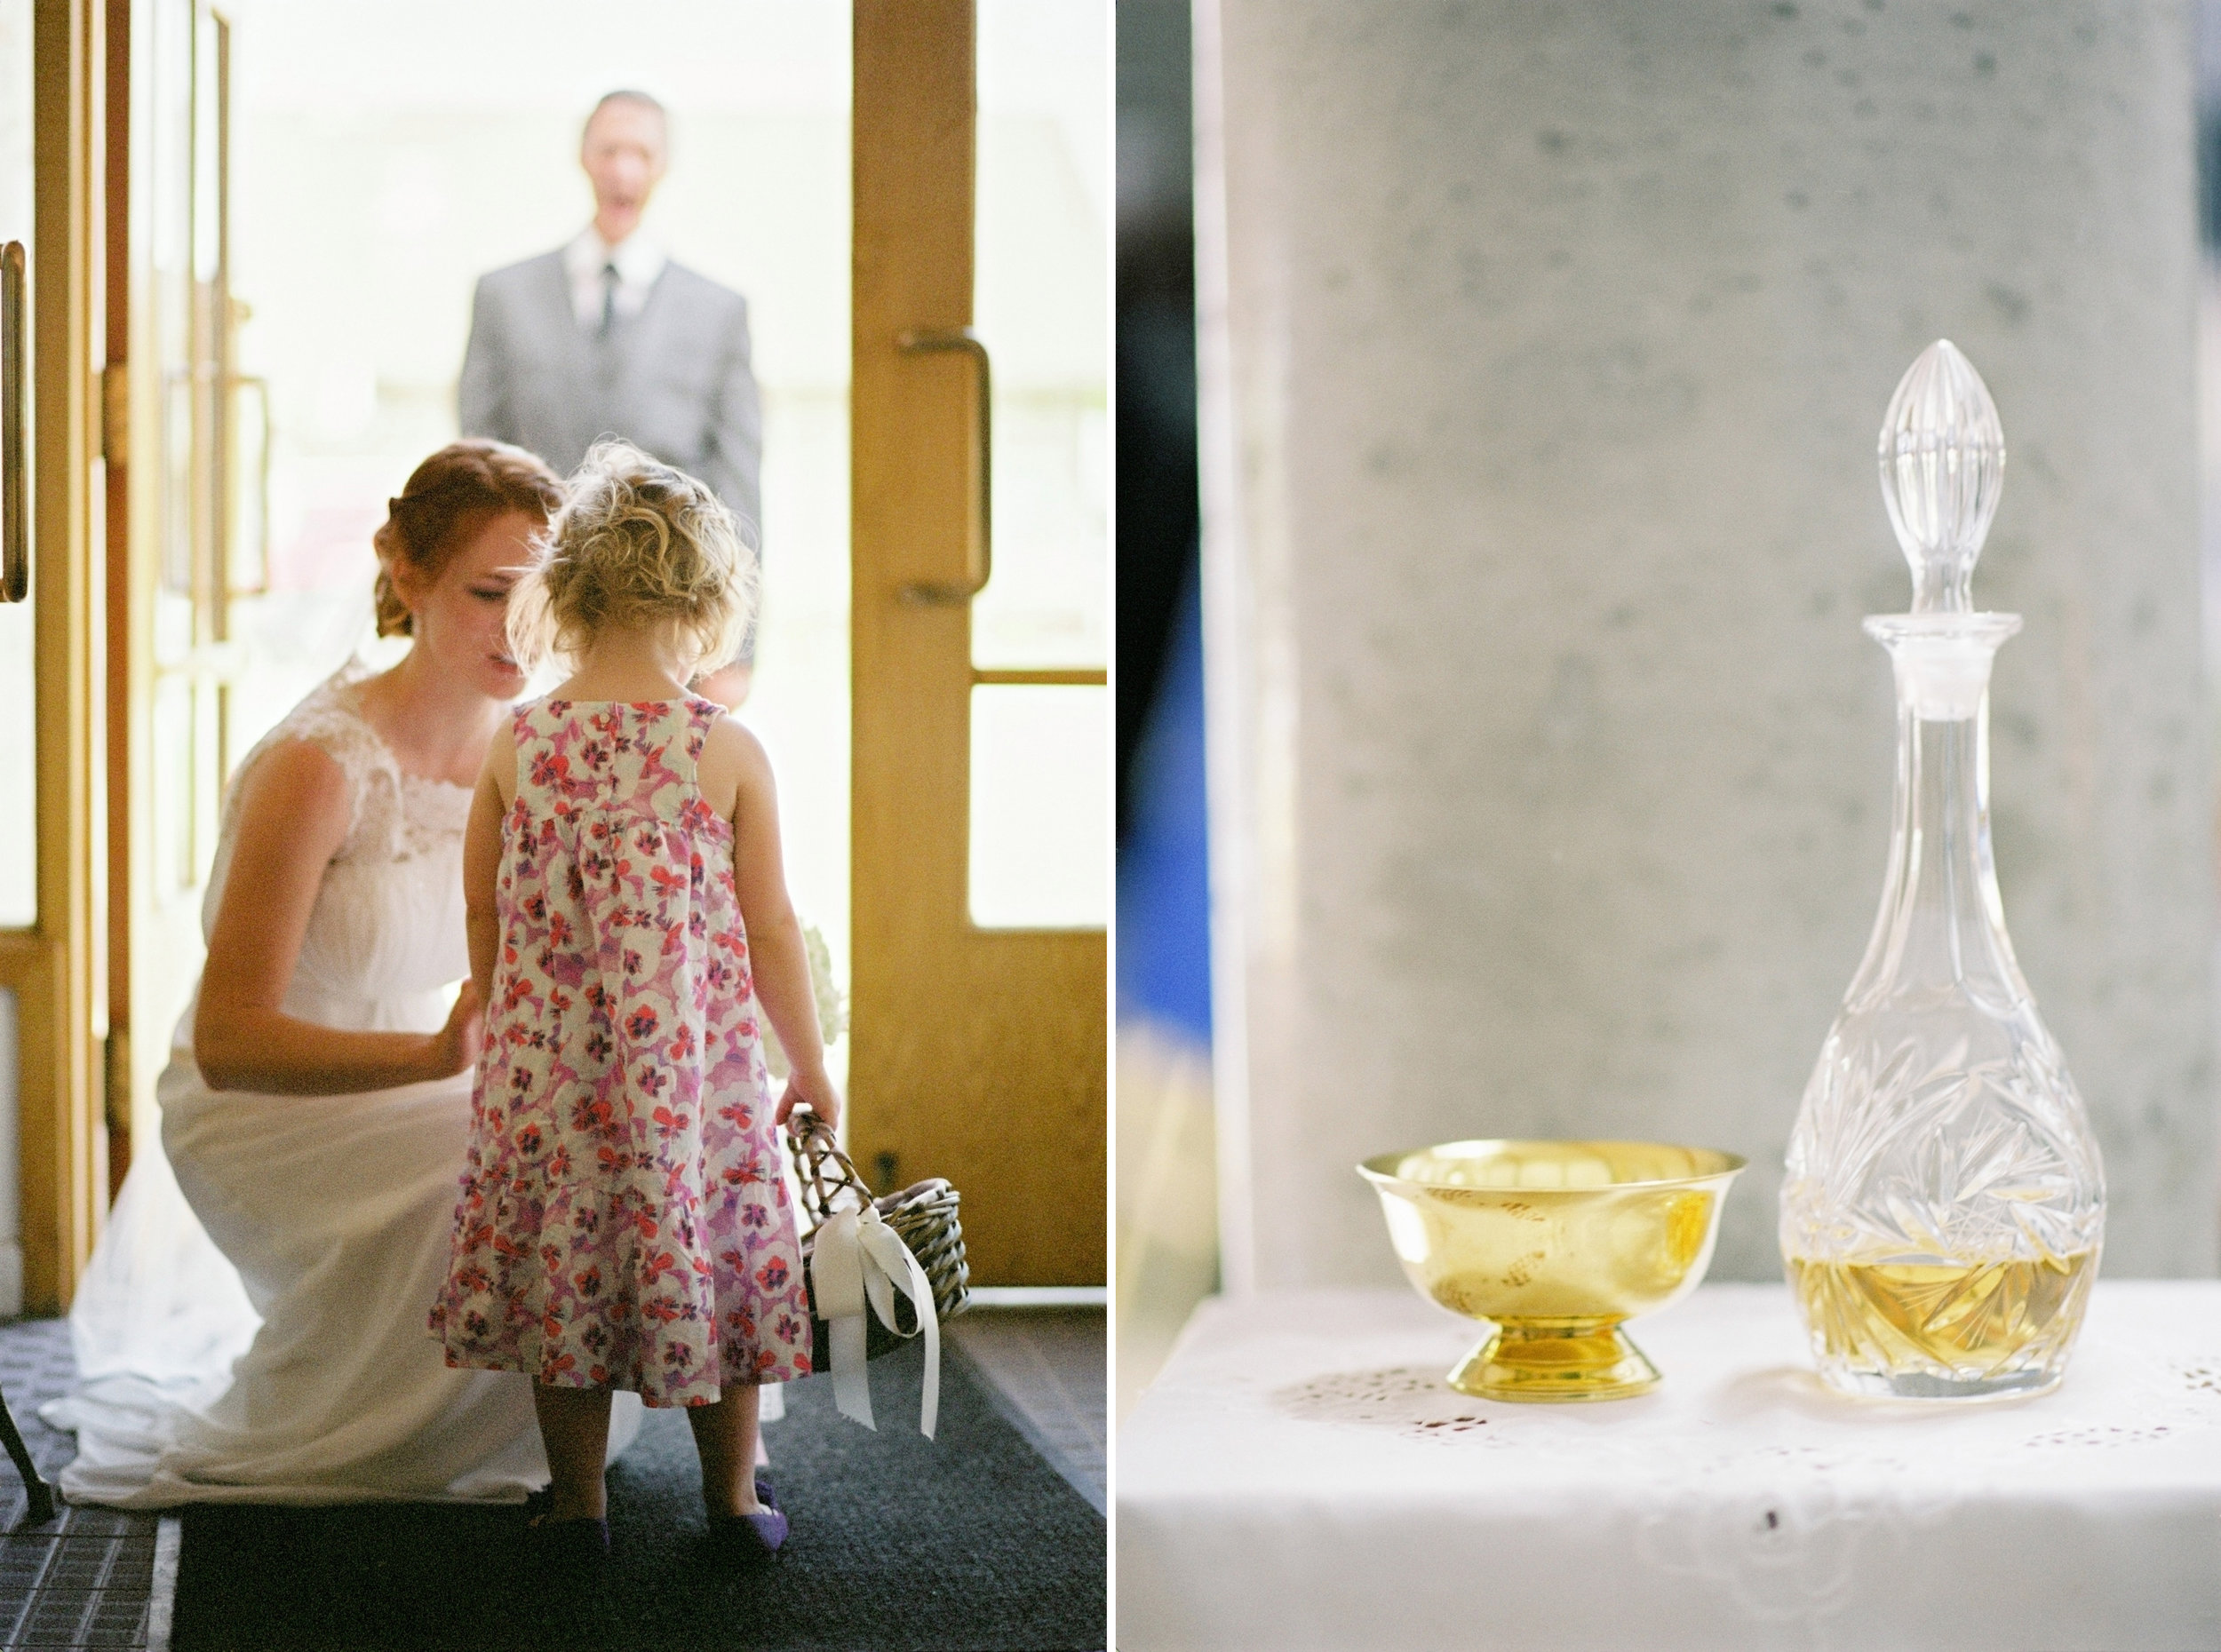 bride-and-flower-girl-meeting-at-the-church-doors.jpg